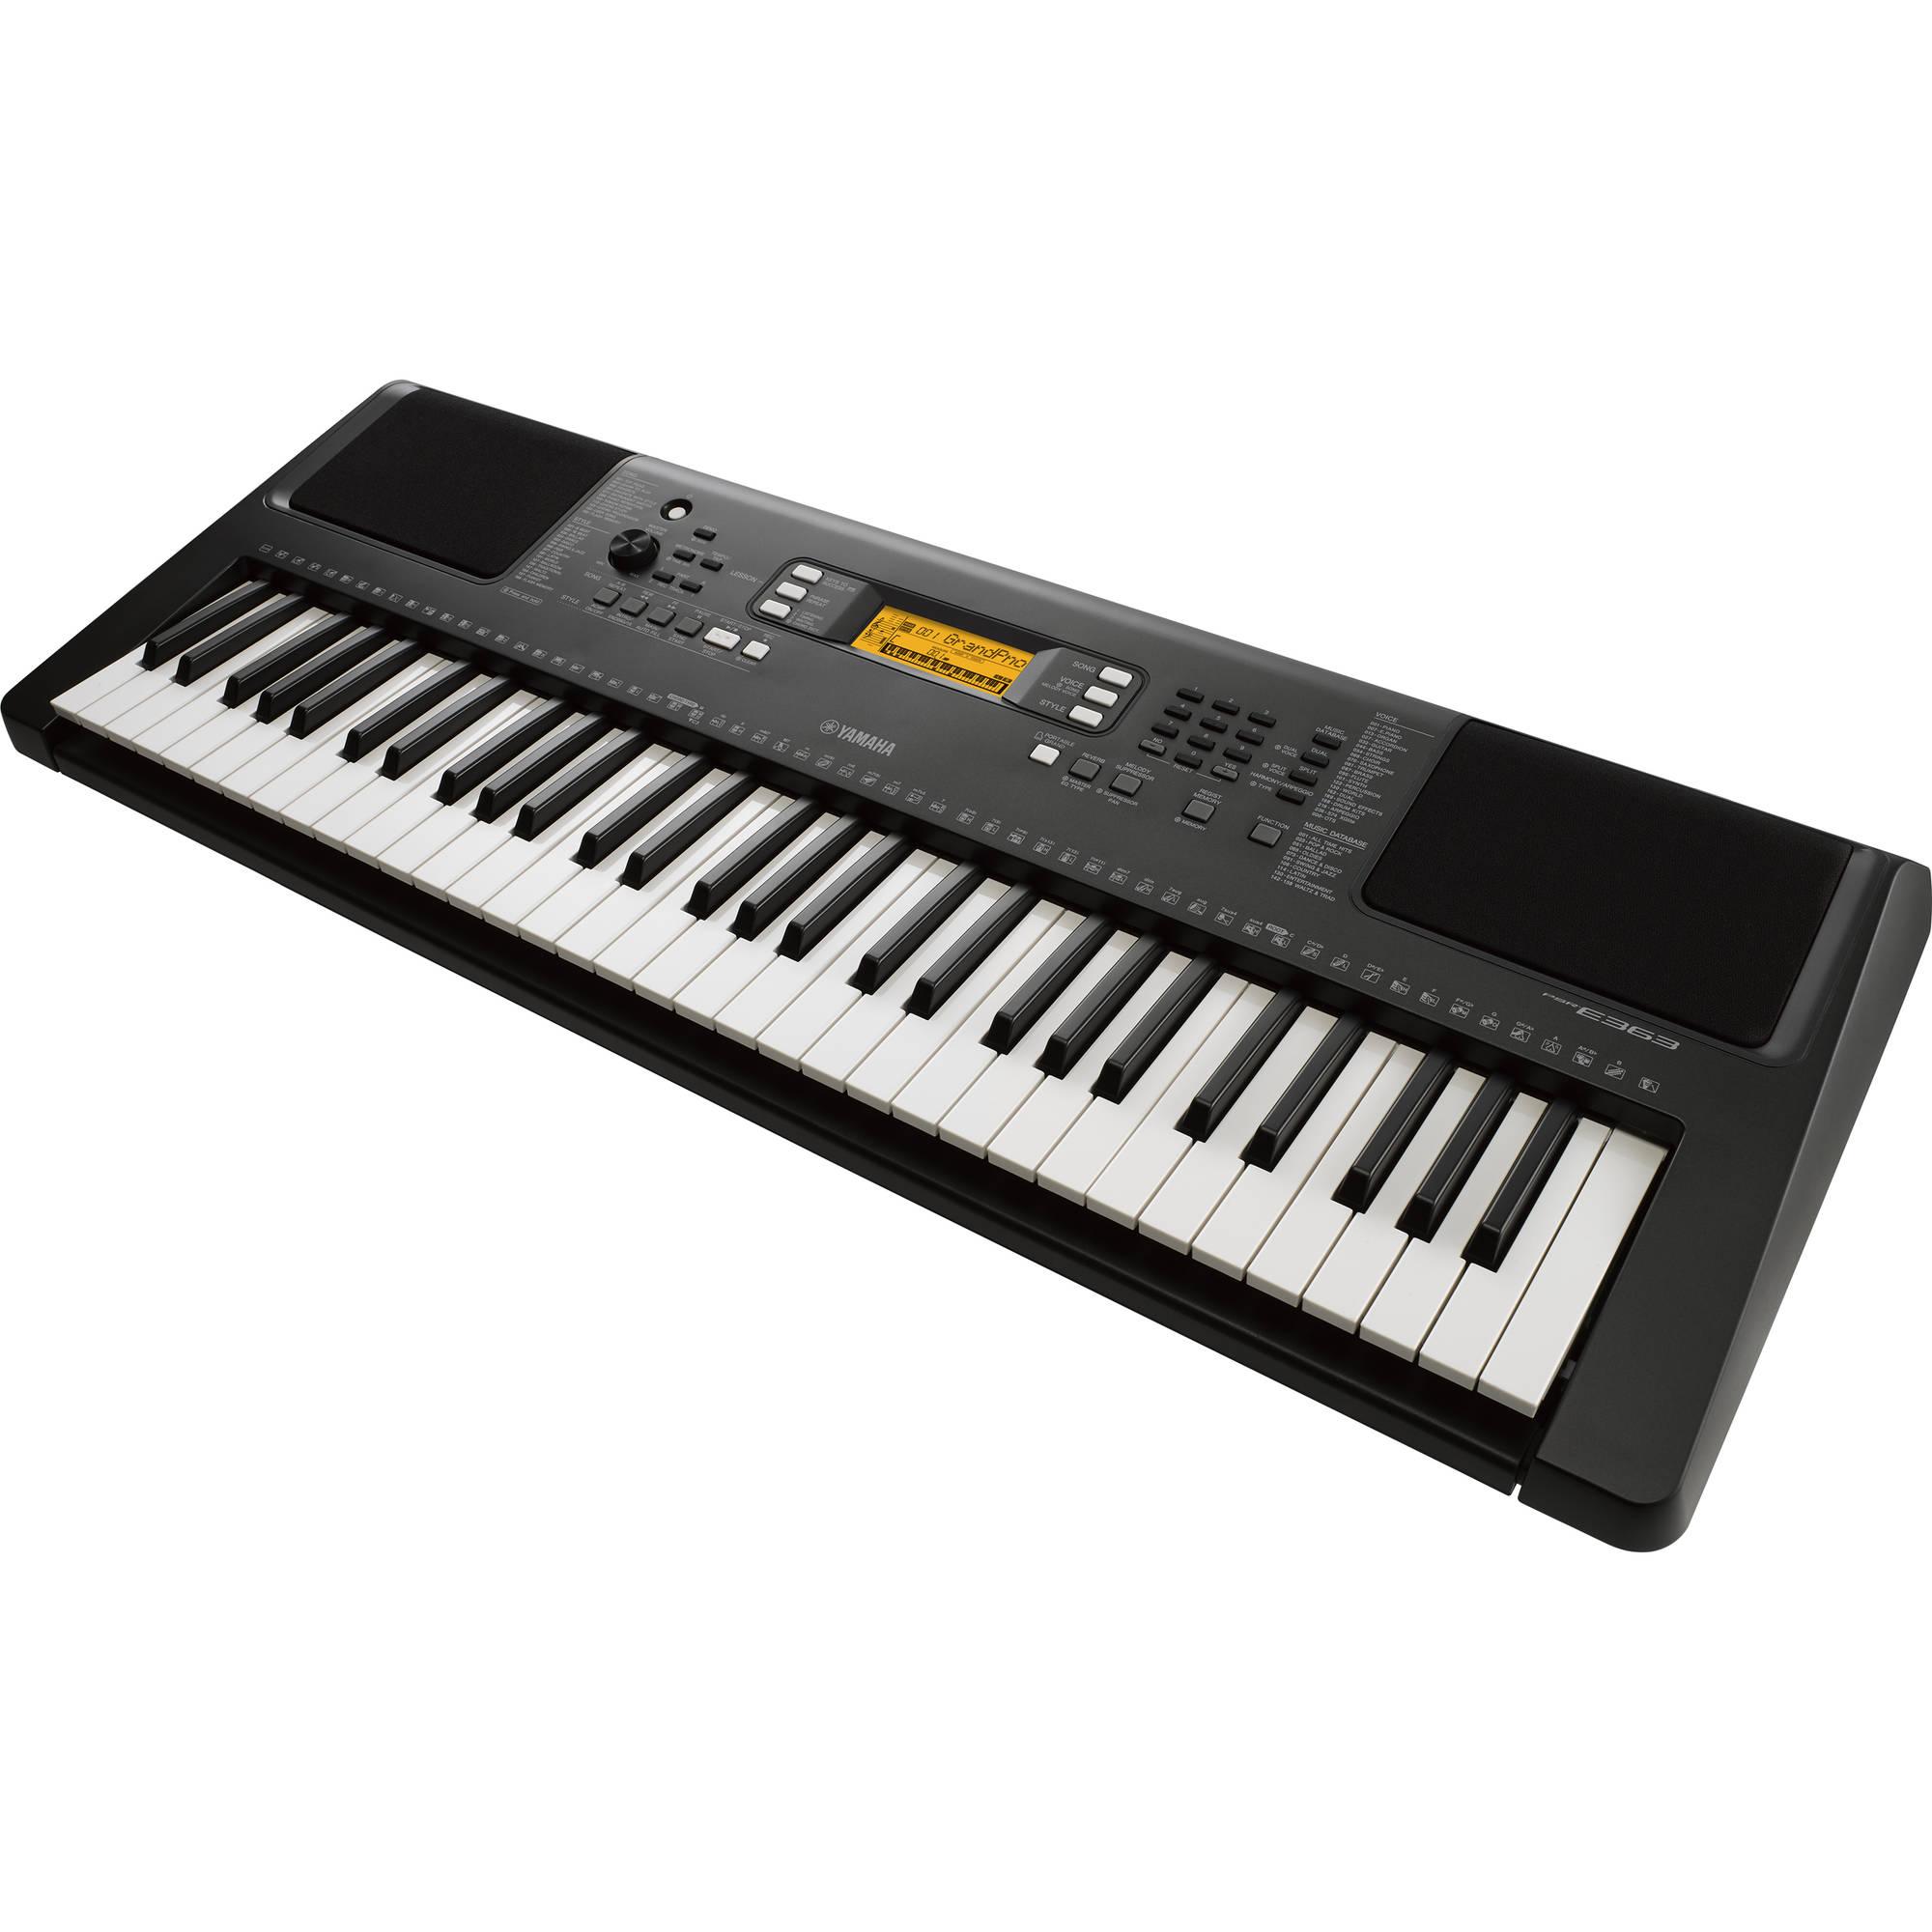 Yamaha Psr E363 Touch Sensitive Portable Keyboard